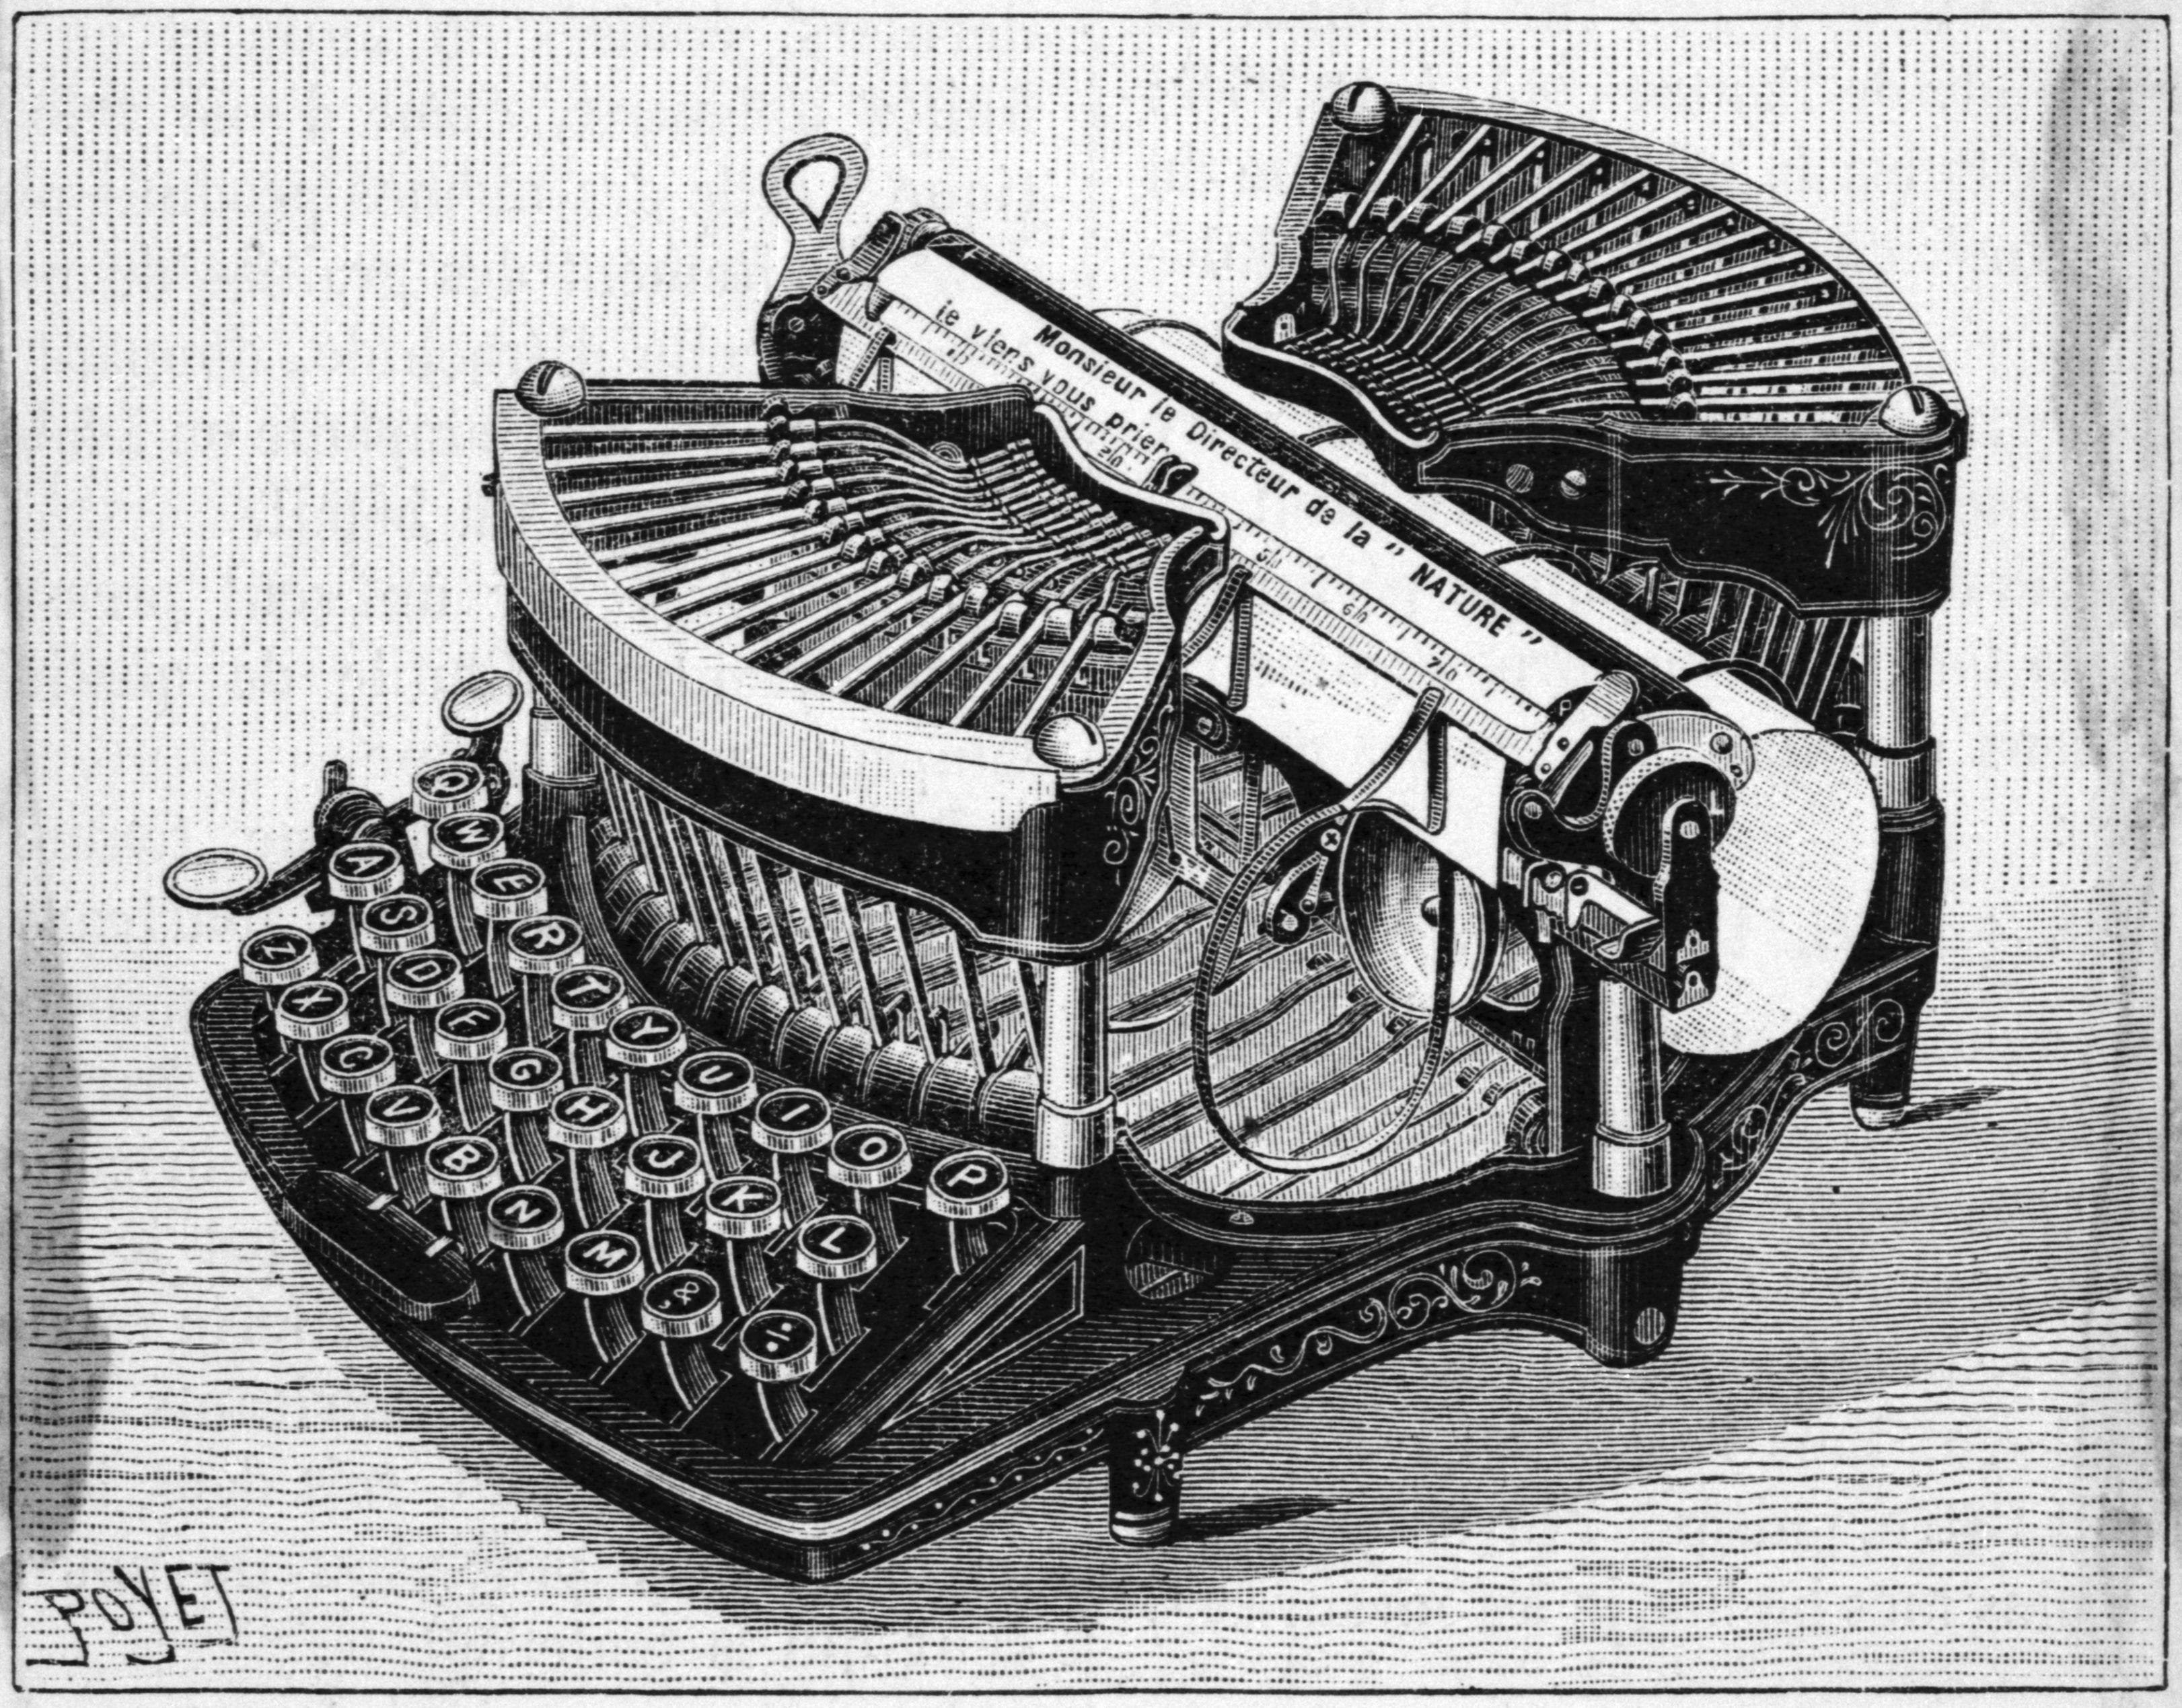 Engraving of the Williams Typewriter by E. Poyet